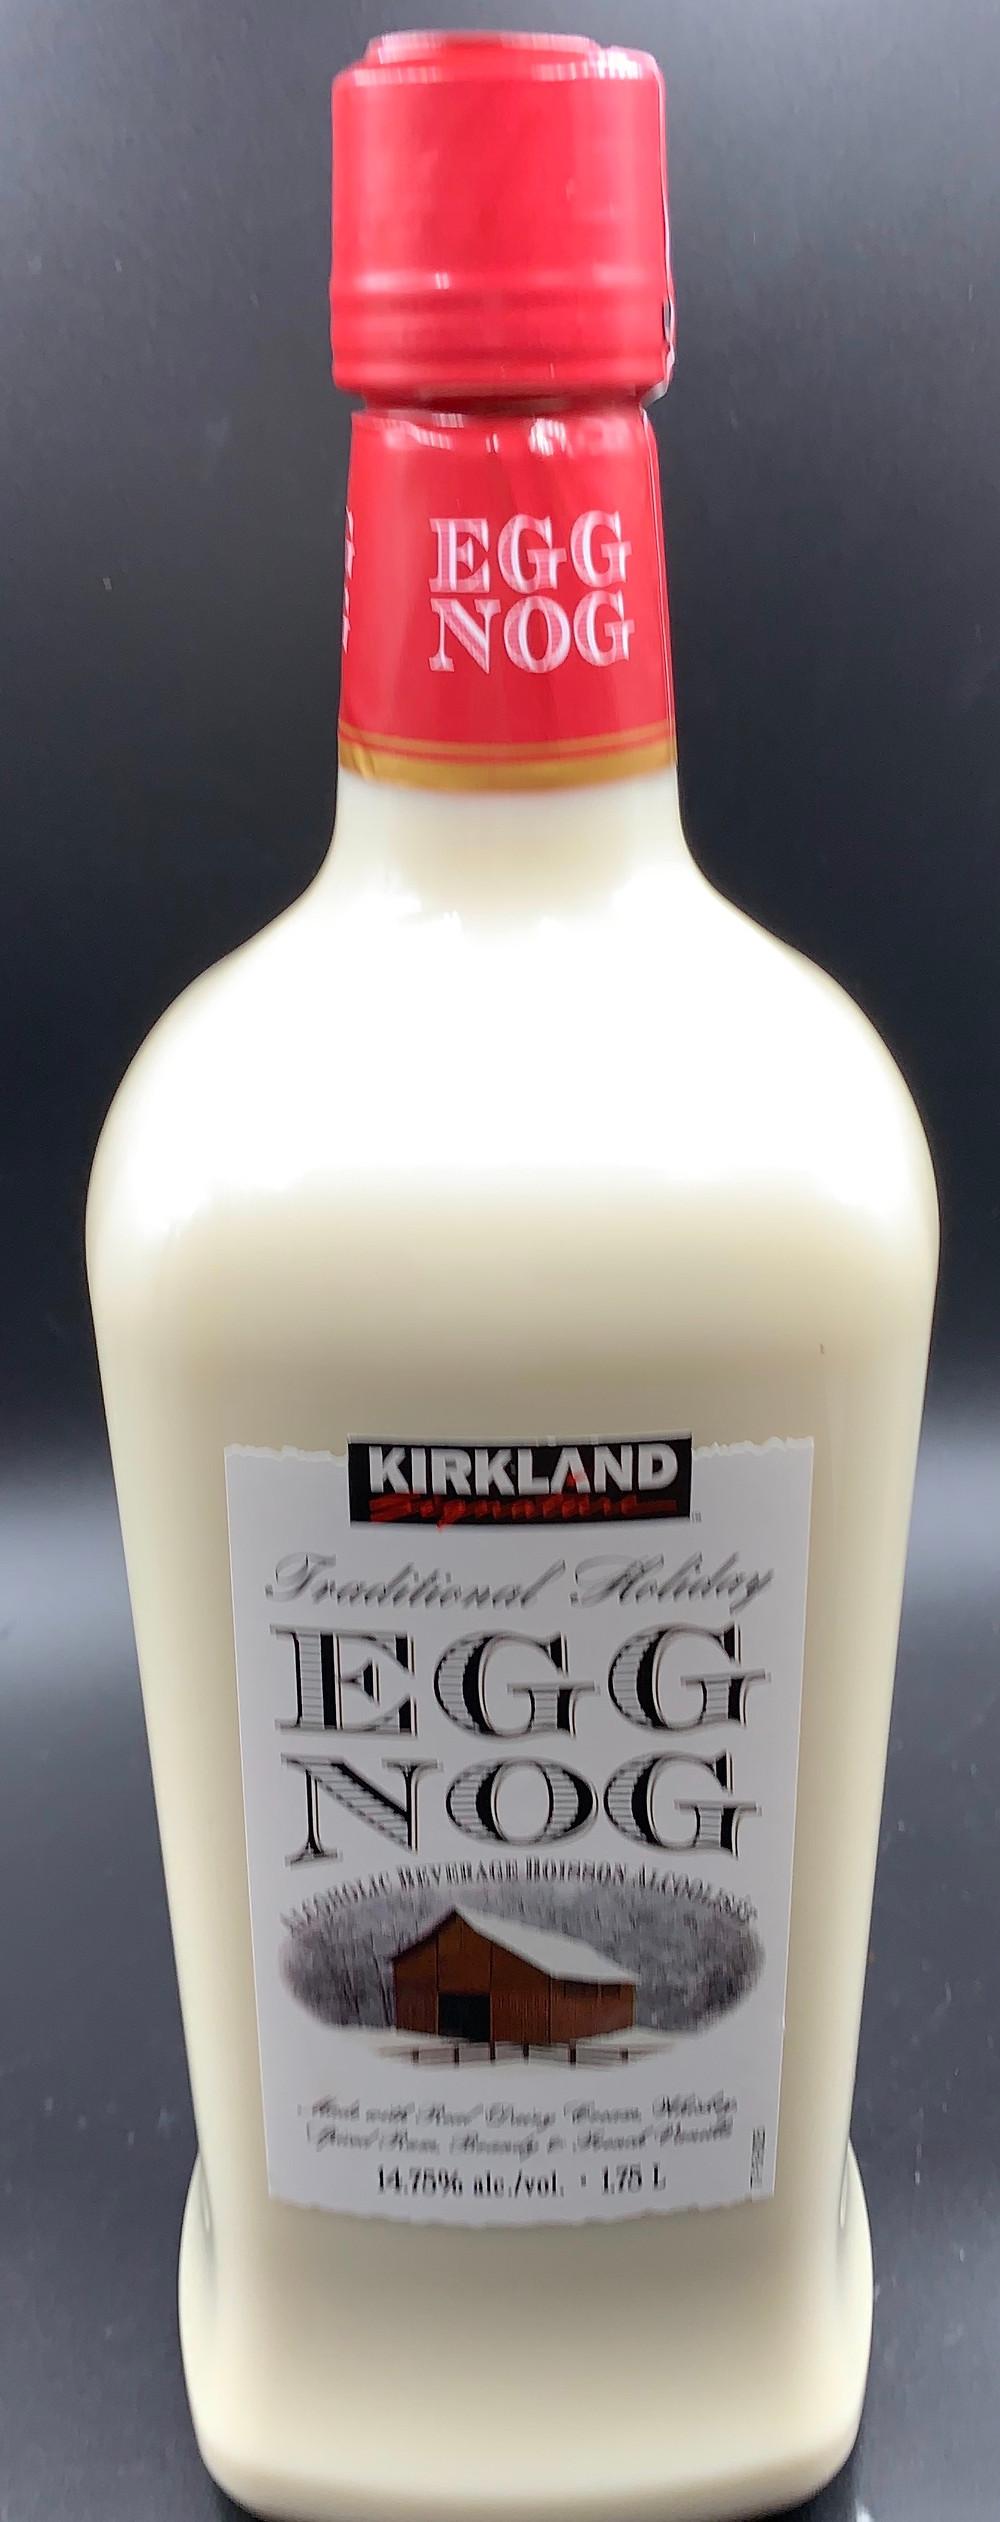 Costco Kirkland Signature Traditional Holiday Egg Nog Alcoholic Beverage